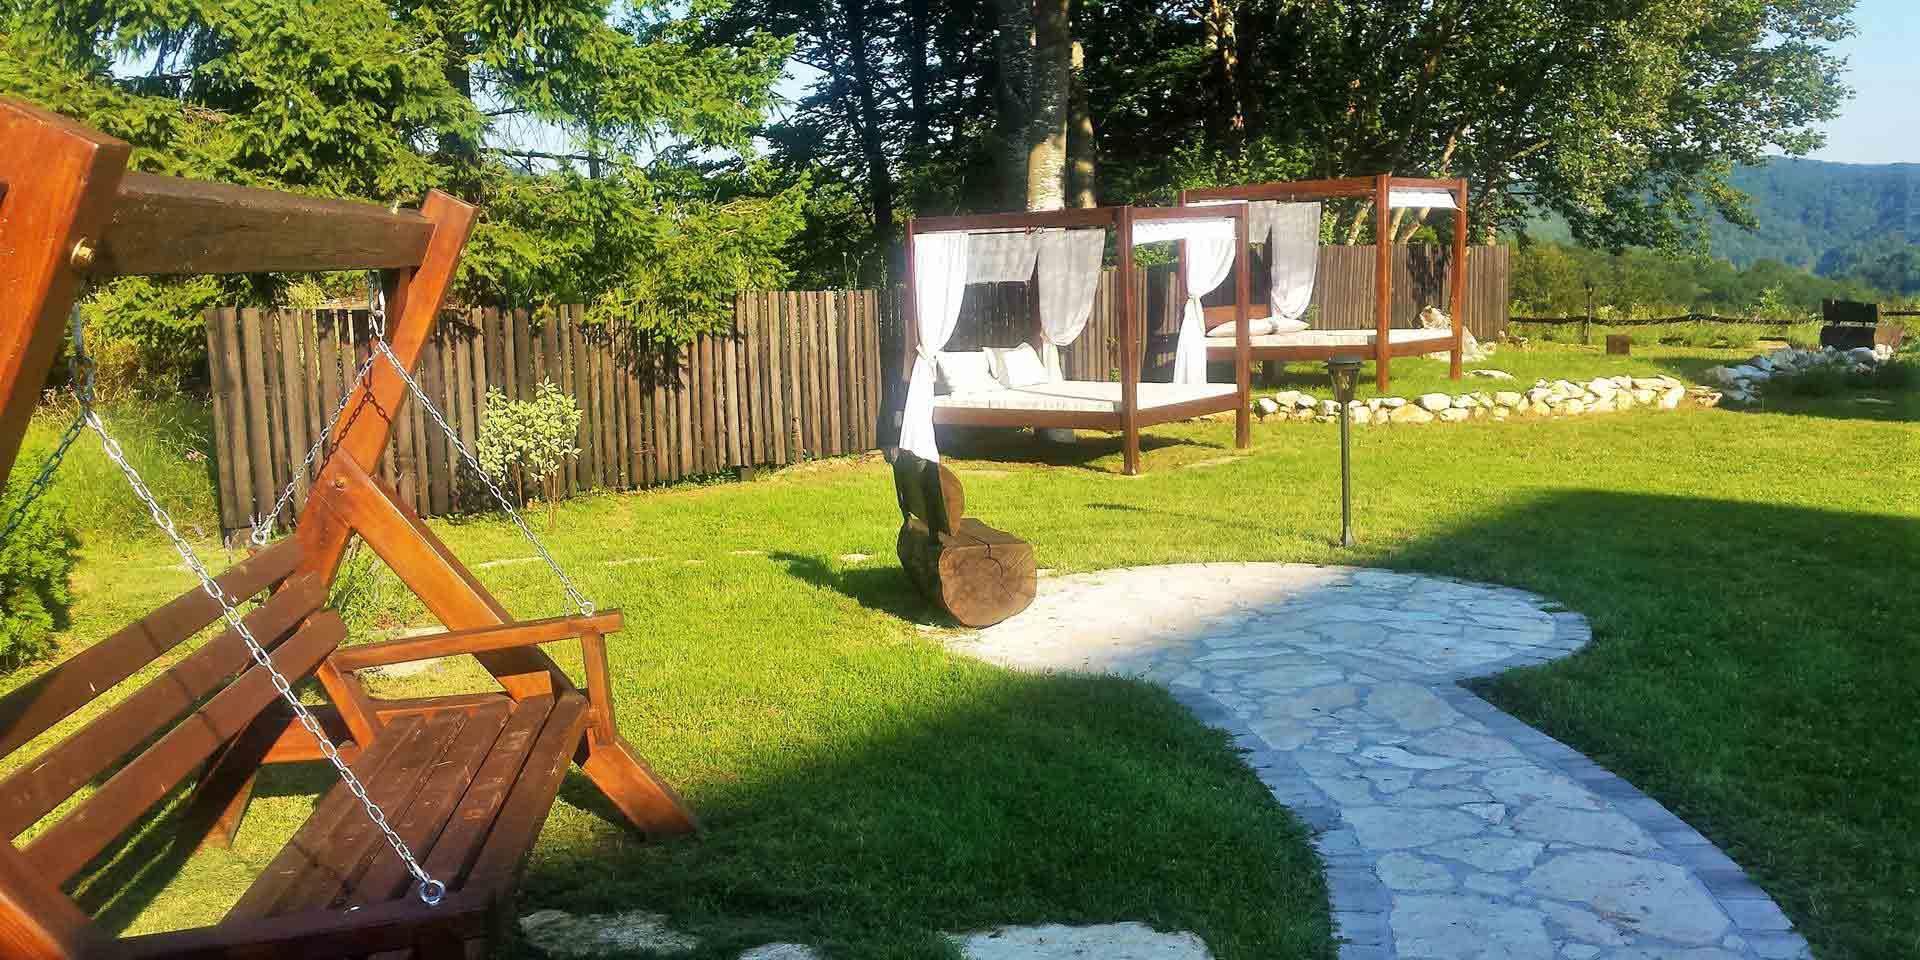 Plitvice Lakes Plitvice etnogarden All you need is etno garden 1